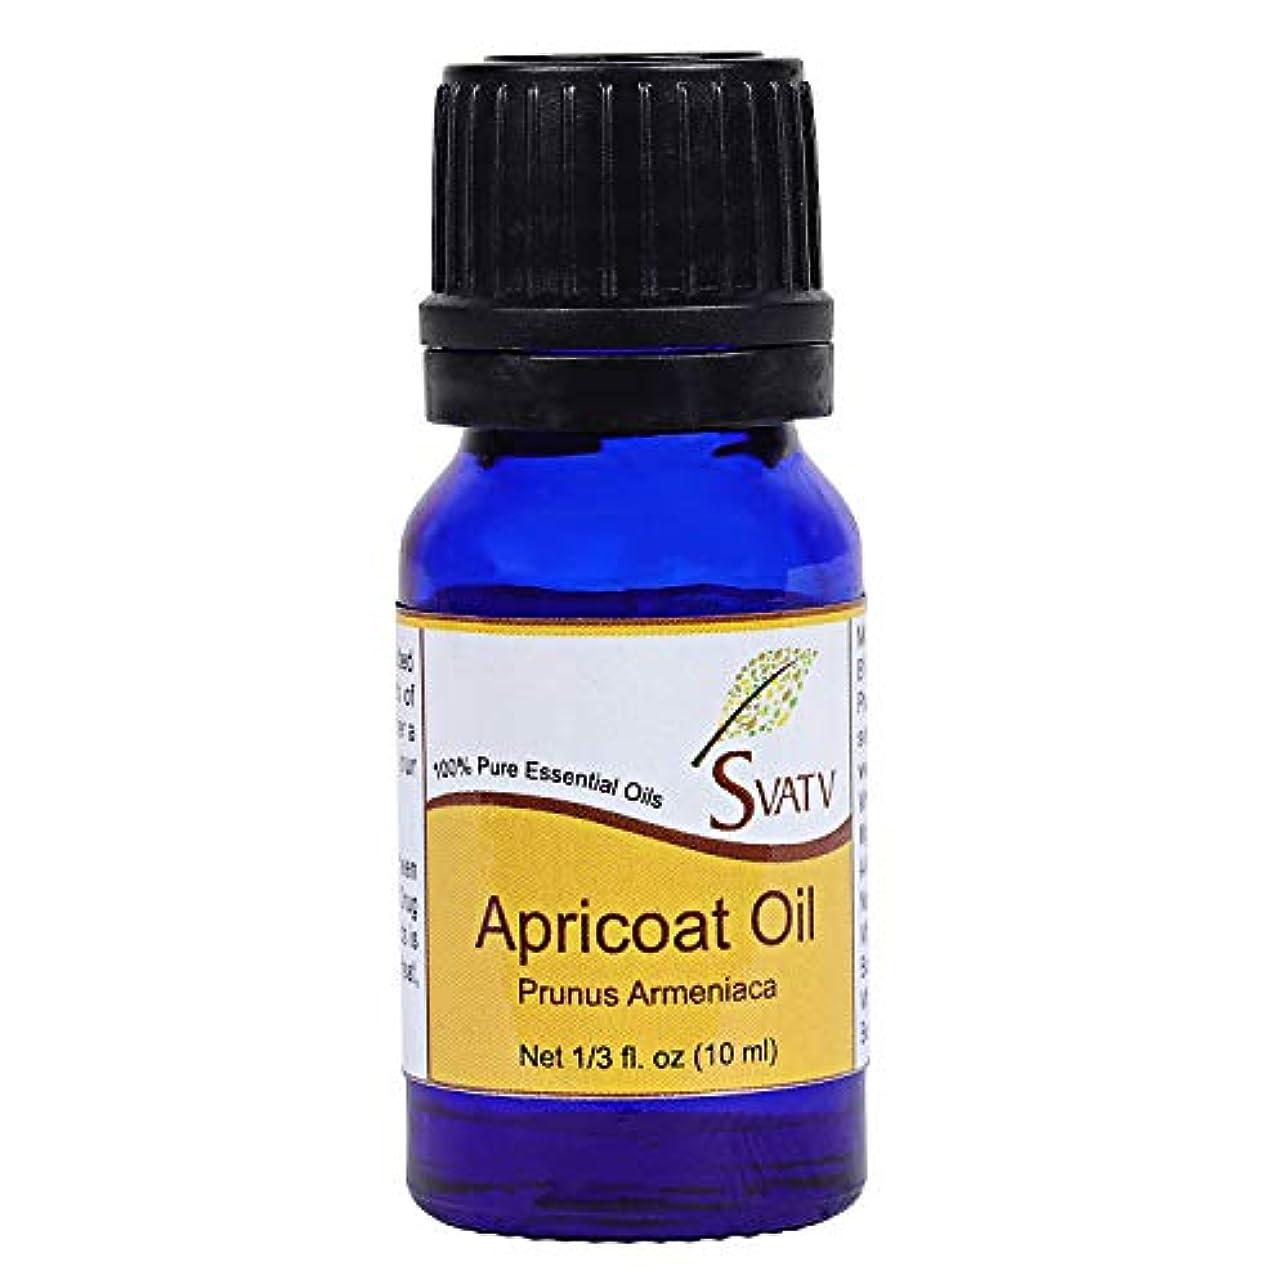 シネマ無臭不快SVATV Apricot (Prunus Armeniaca) Essential Oil 10 mL (1/3 oz) Therapeutic Grade, Aromatherapy Essential Oil